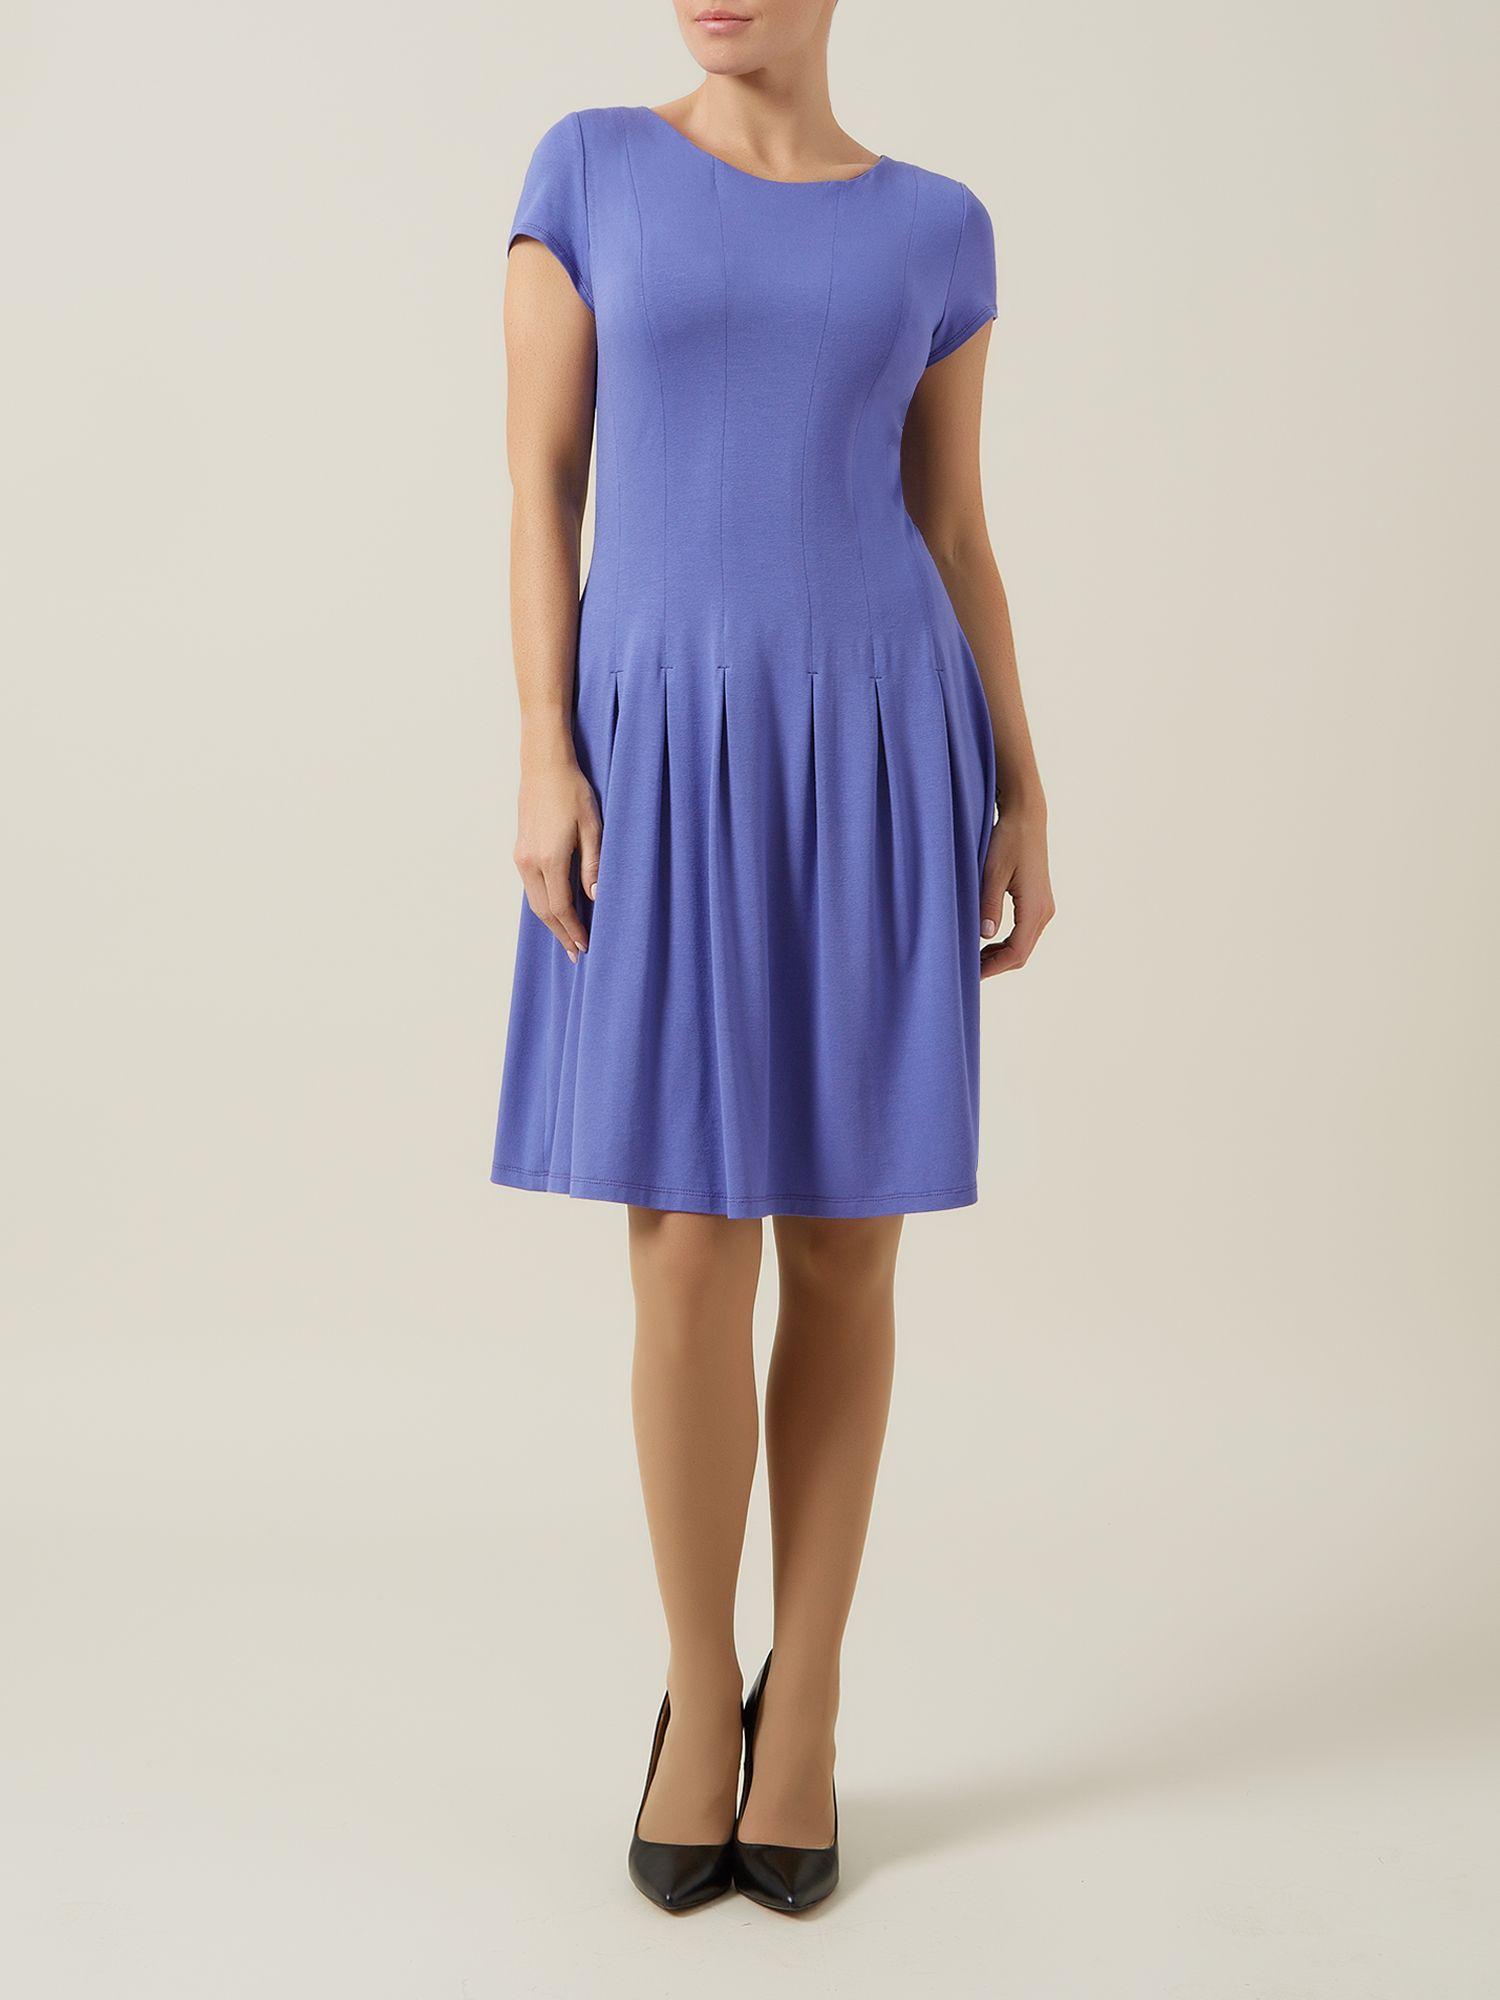 Purple Pleat DressPurple Pleat Dress